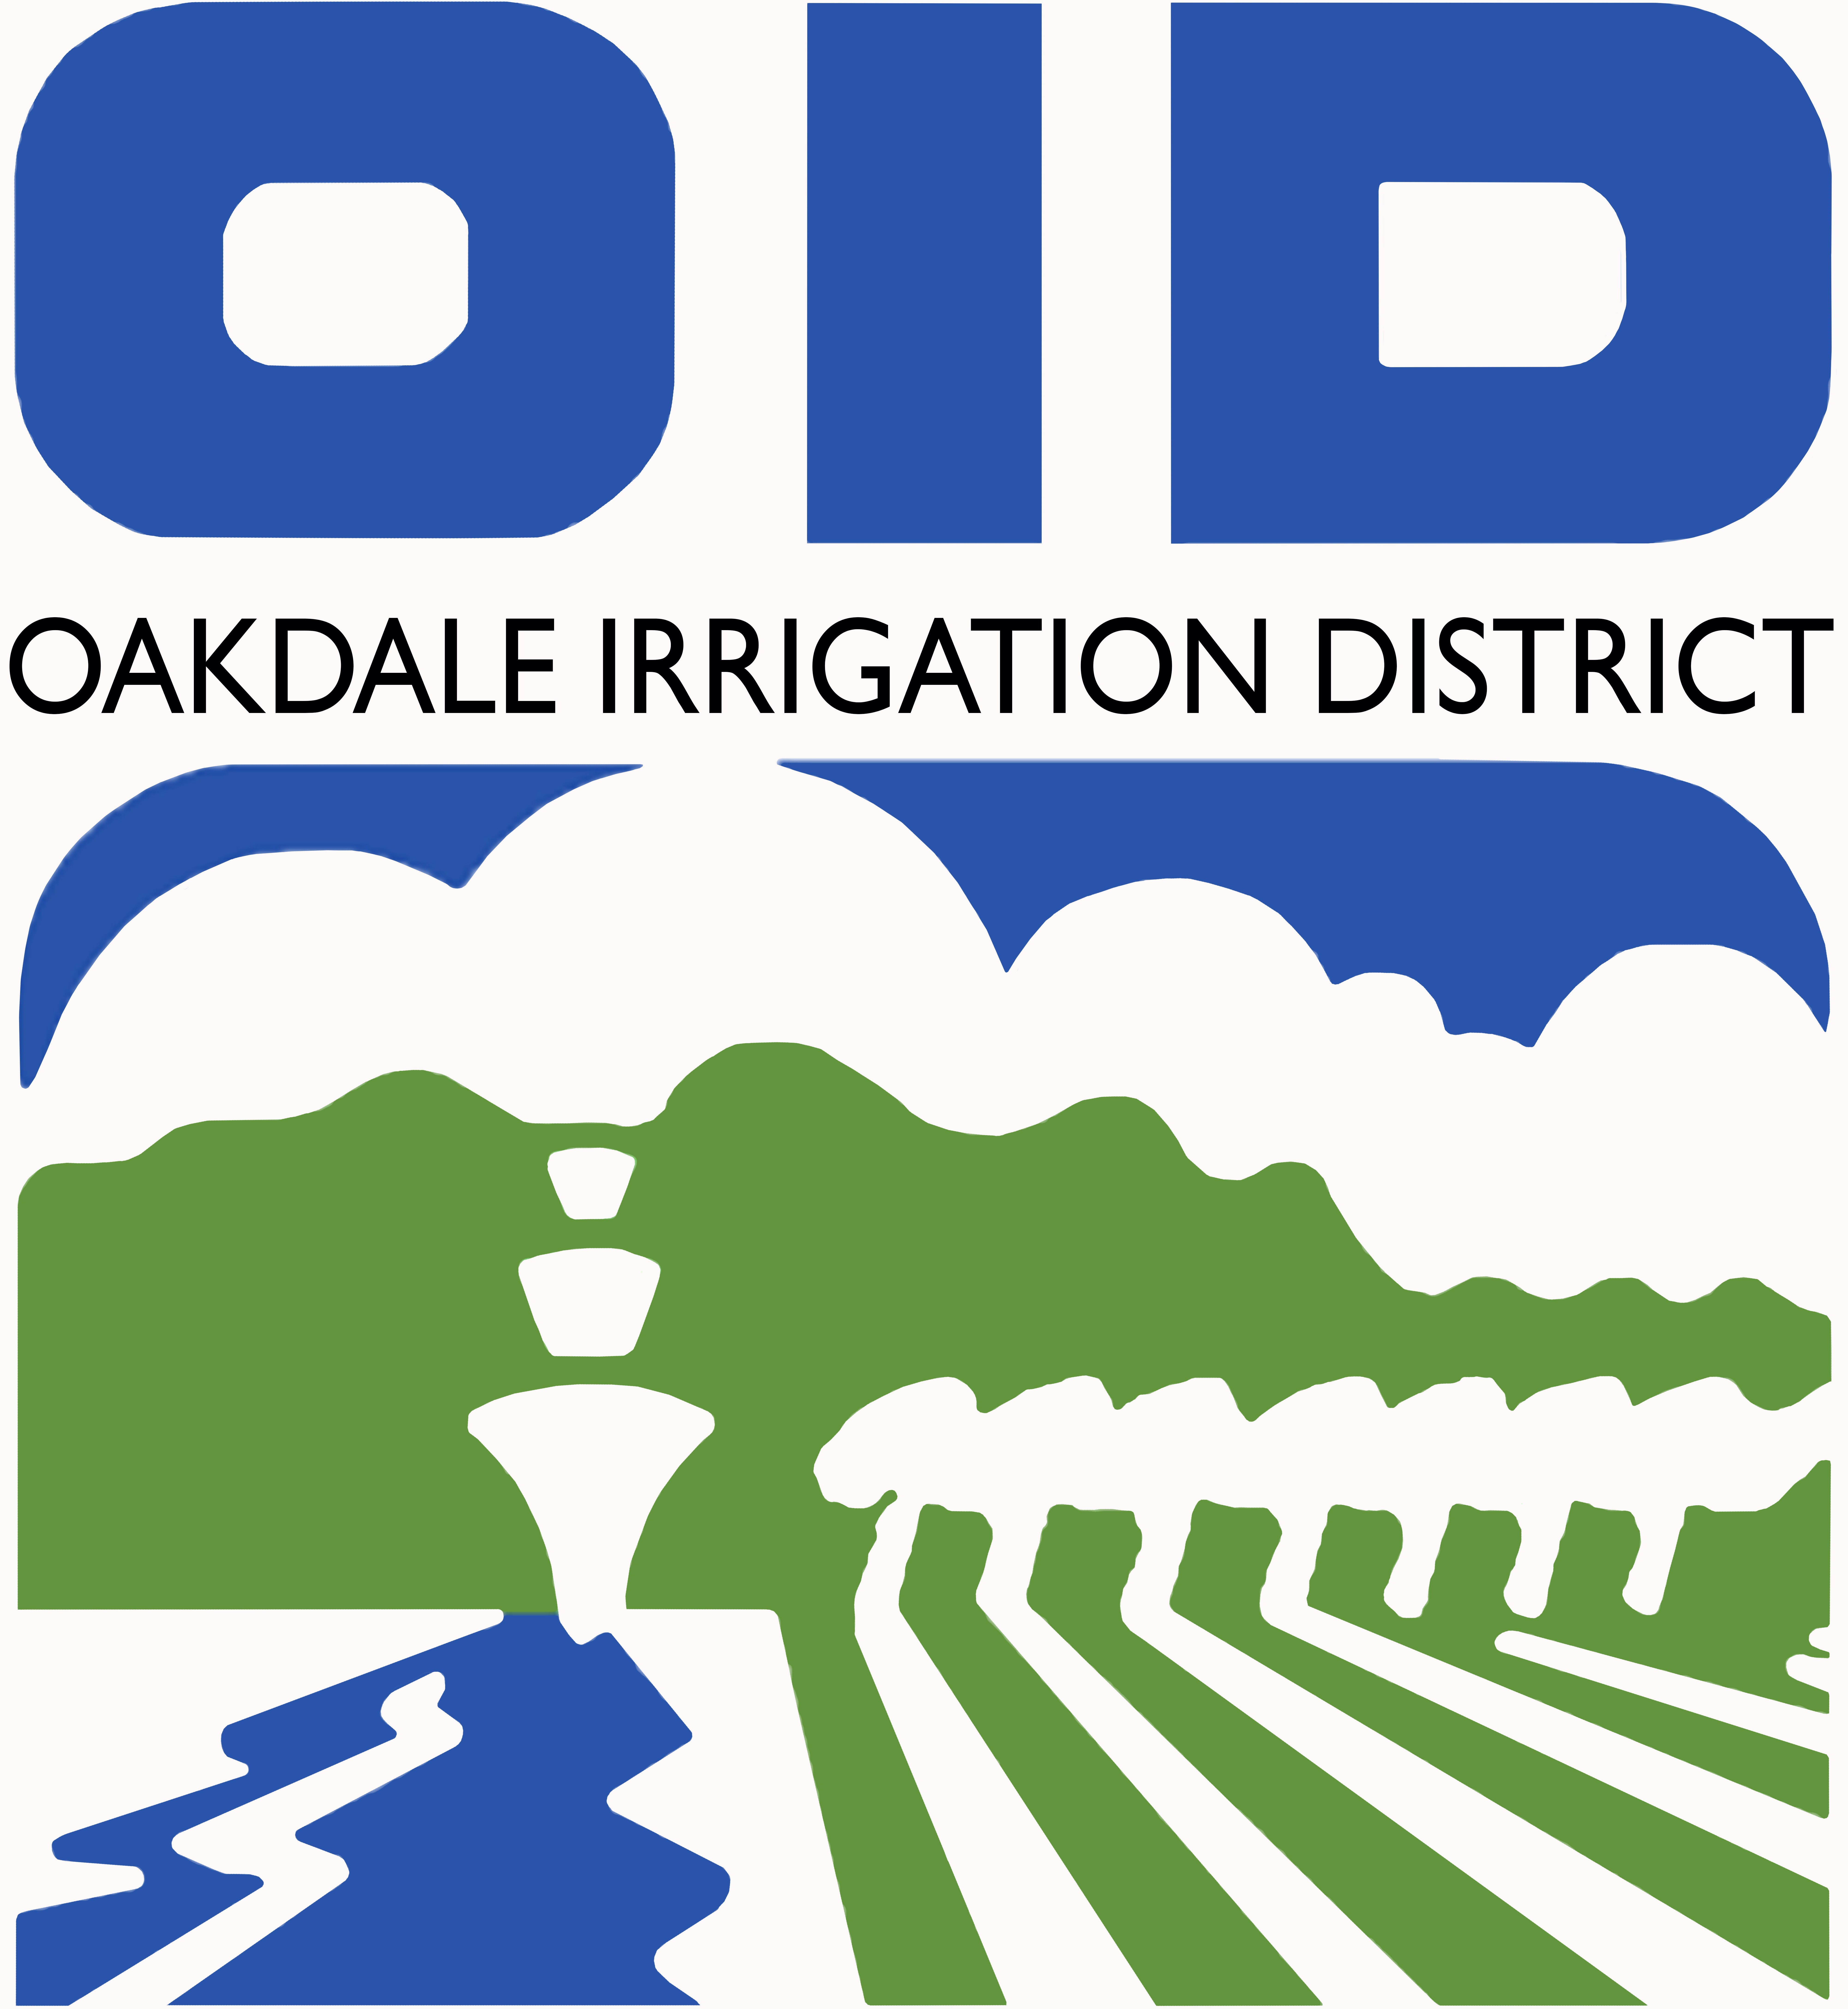 Oakdale Irrigation District